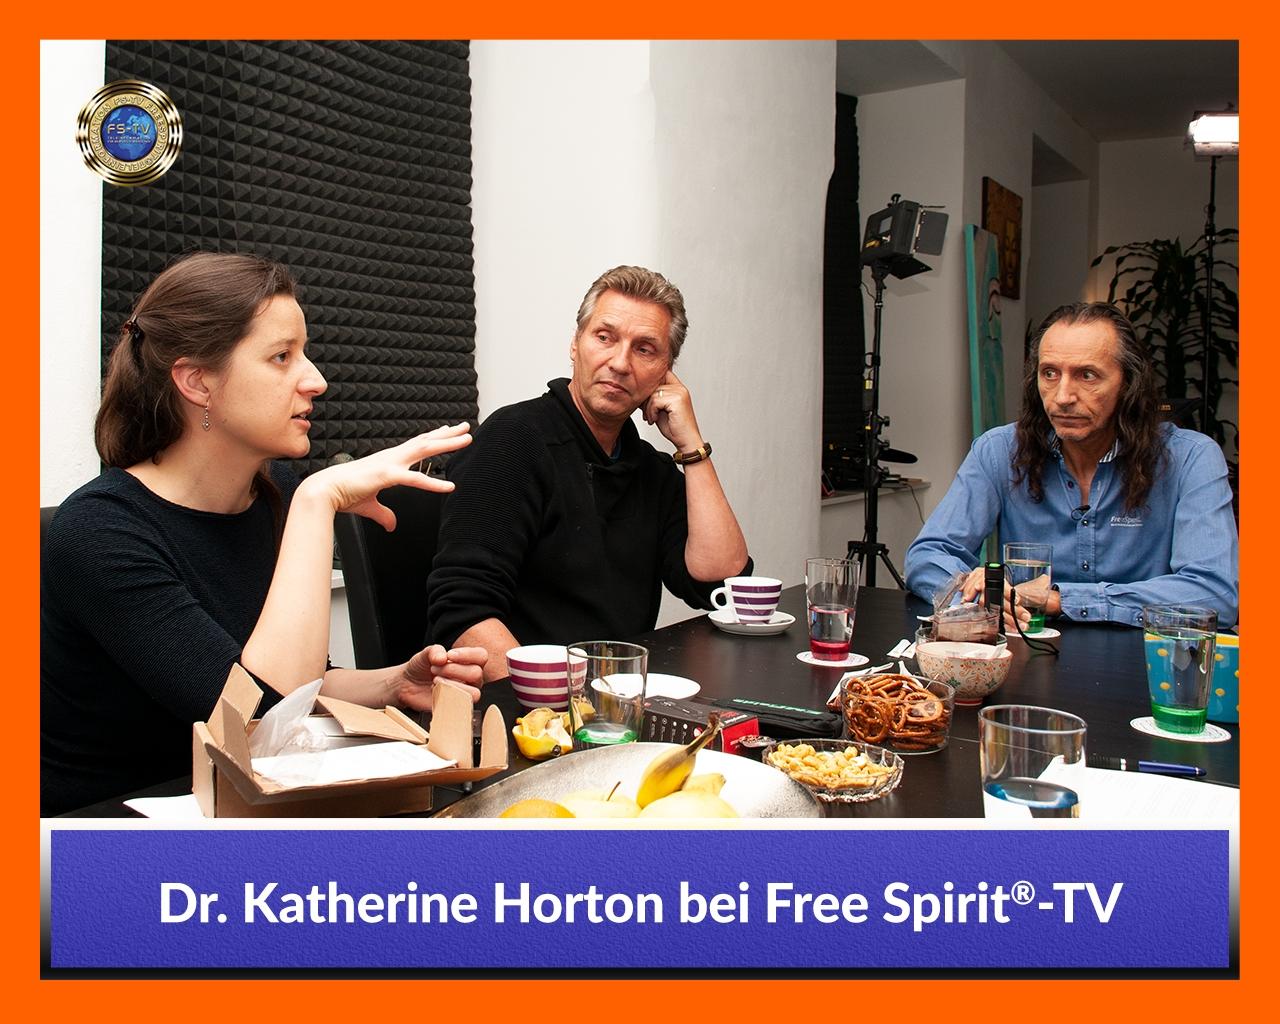 Galleriebild-Dr.Katherine-Horton-5